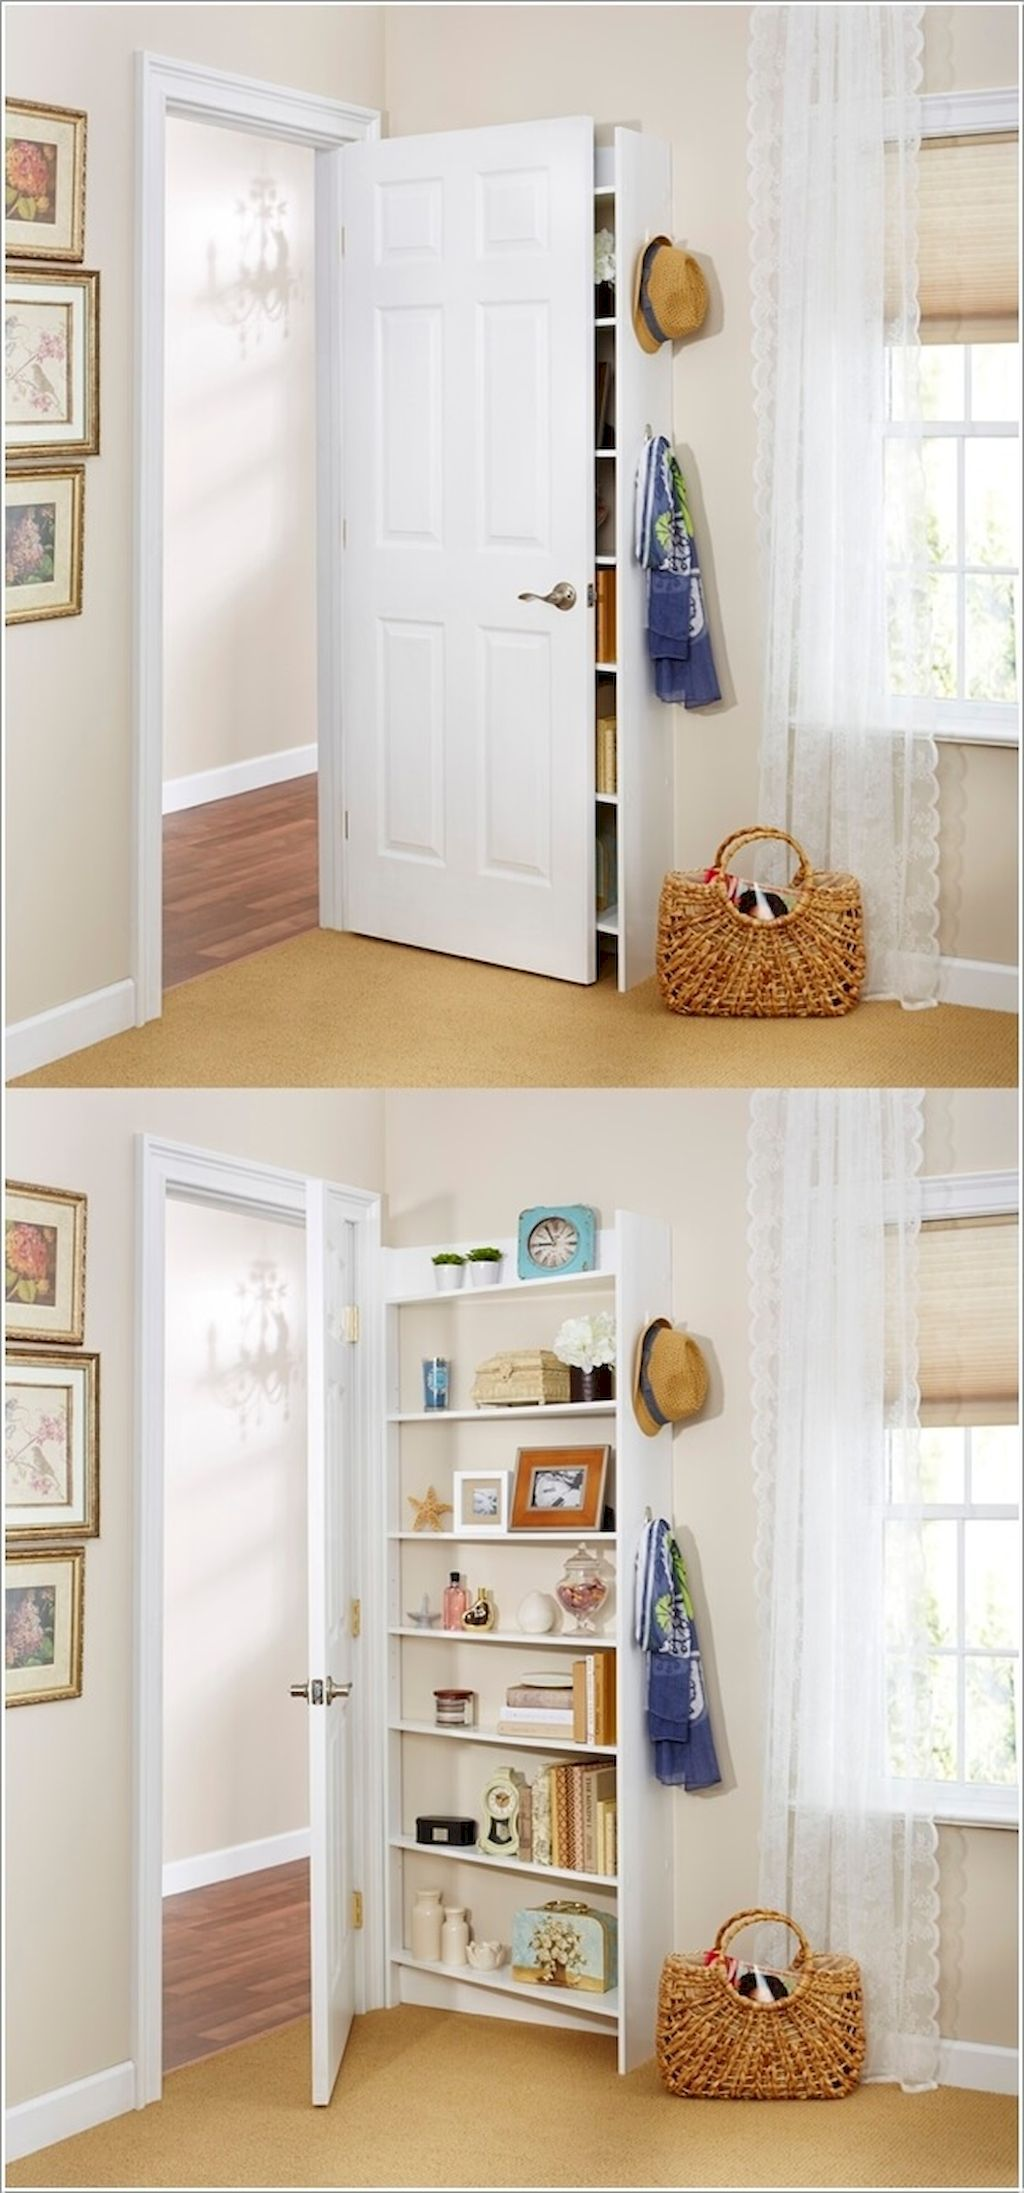 67 Effective and Clever Bedroom Storage Ideas | Bedroom storage ...